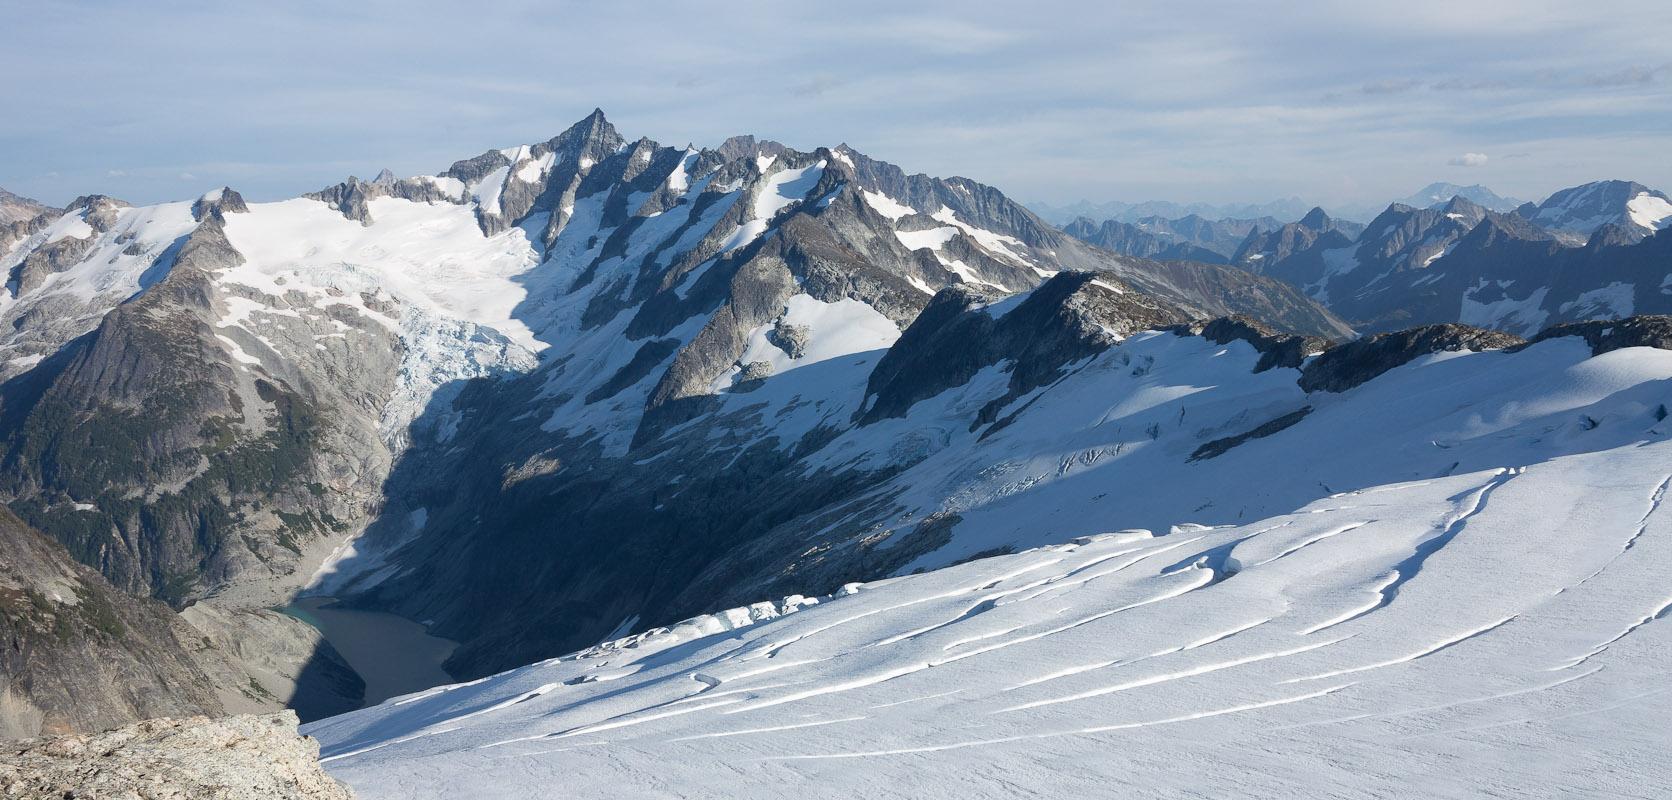 The Inspiration Glacier slips away east toward Forbidden Peak.